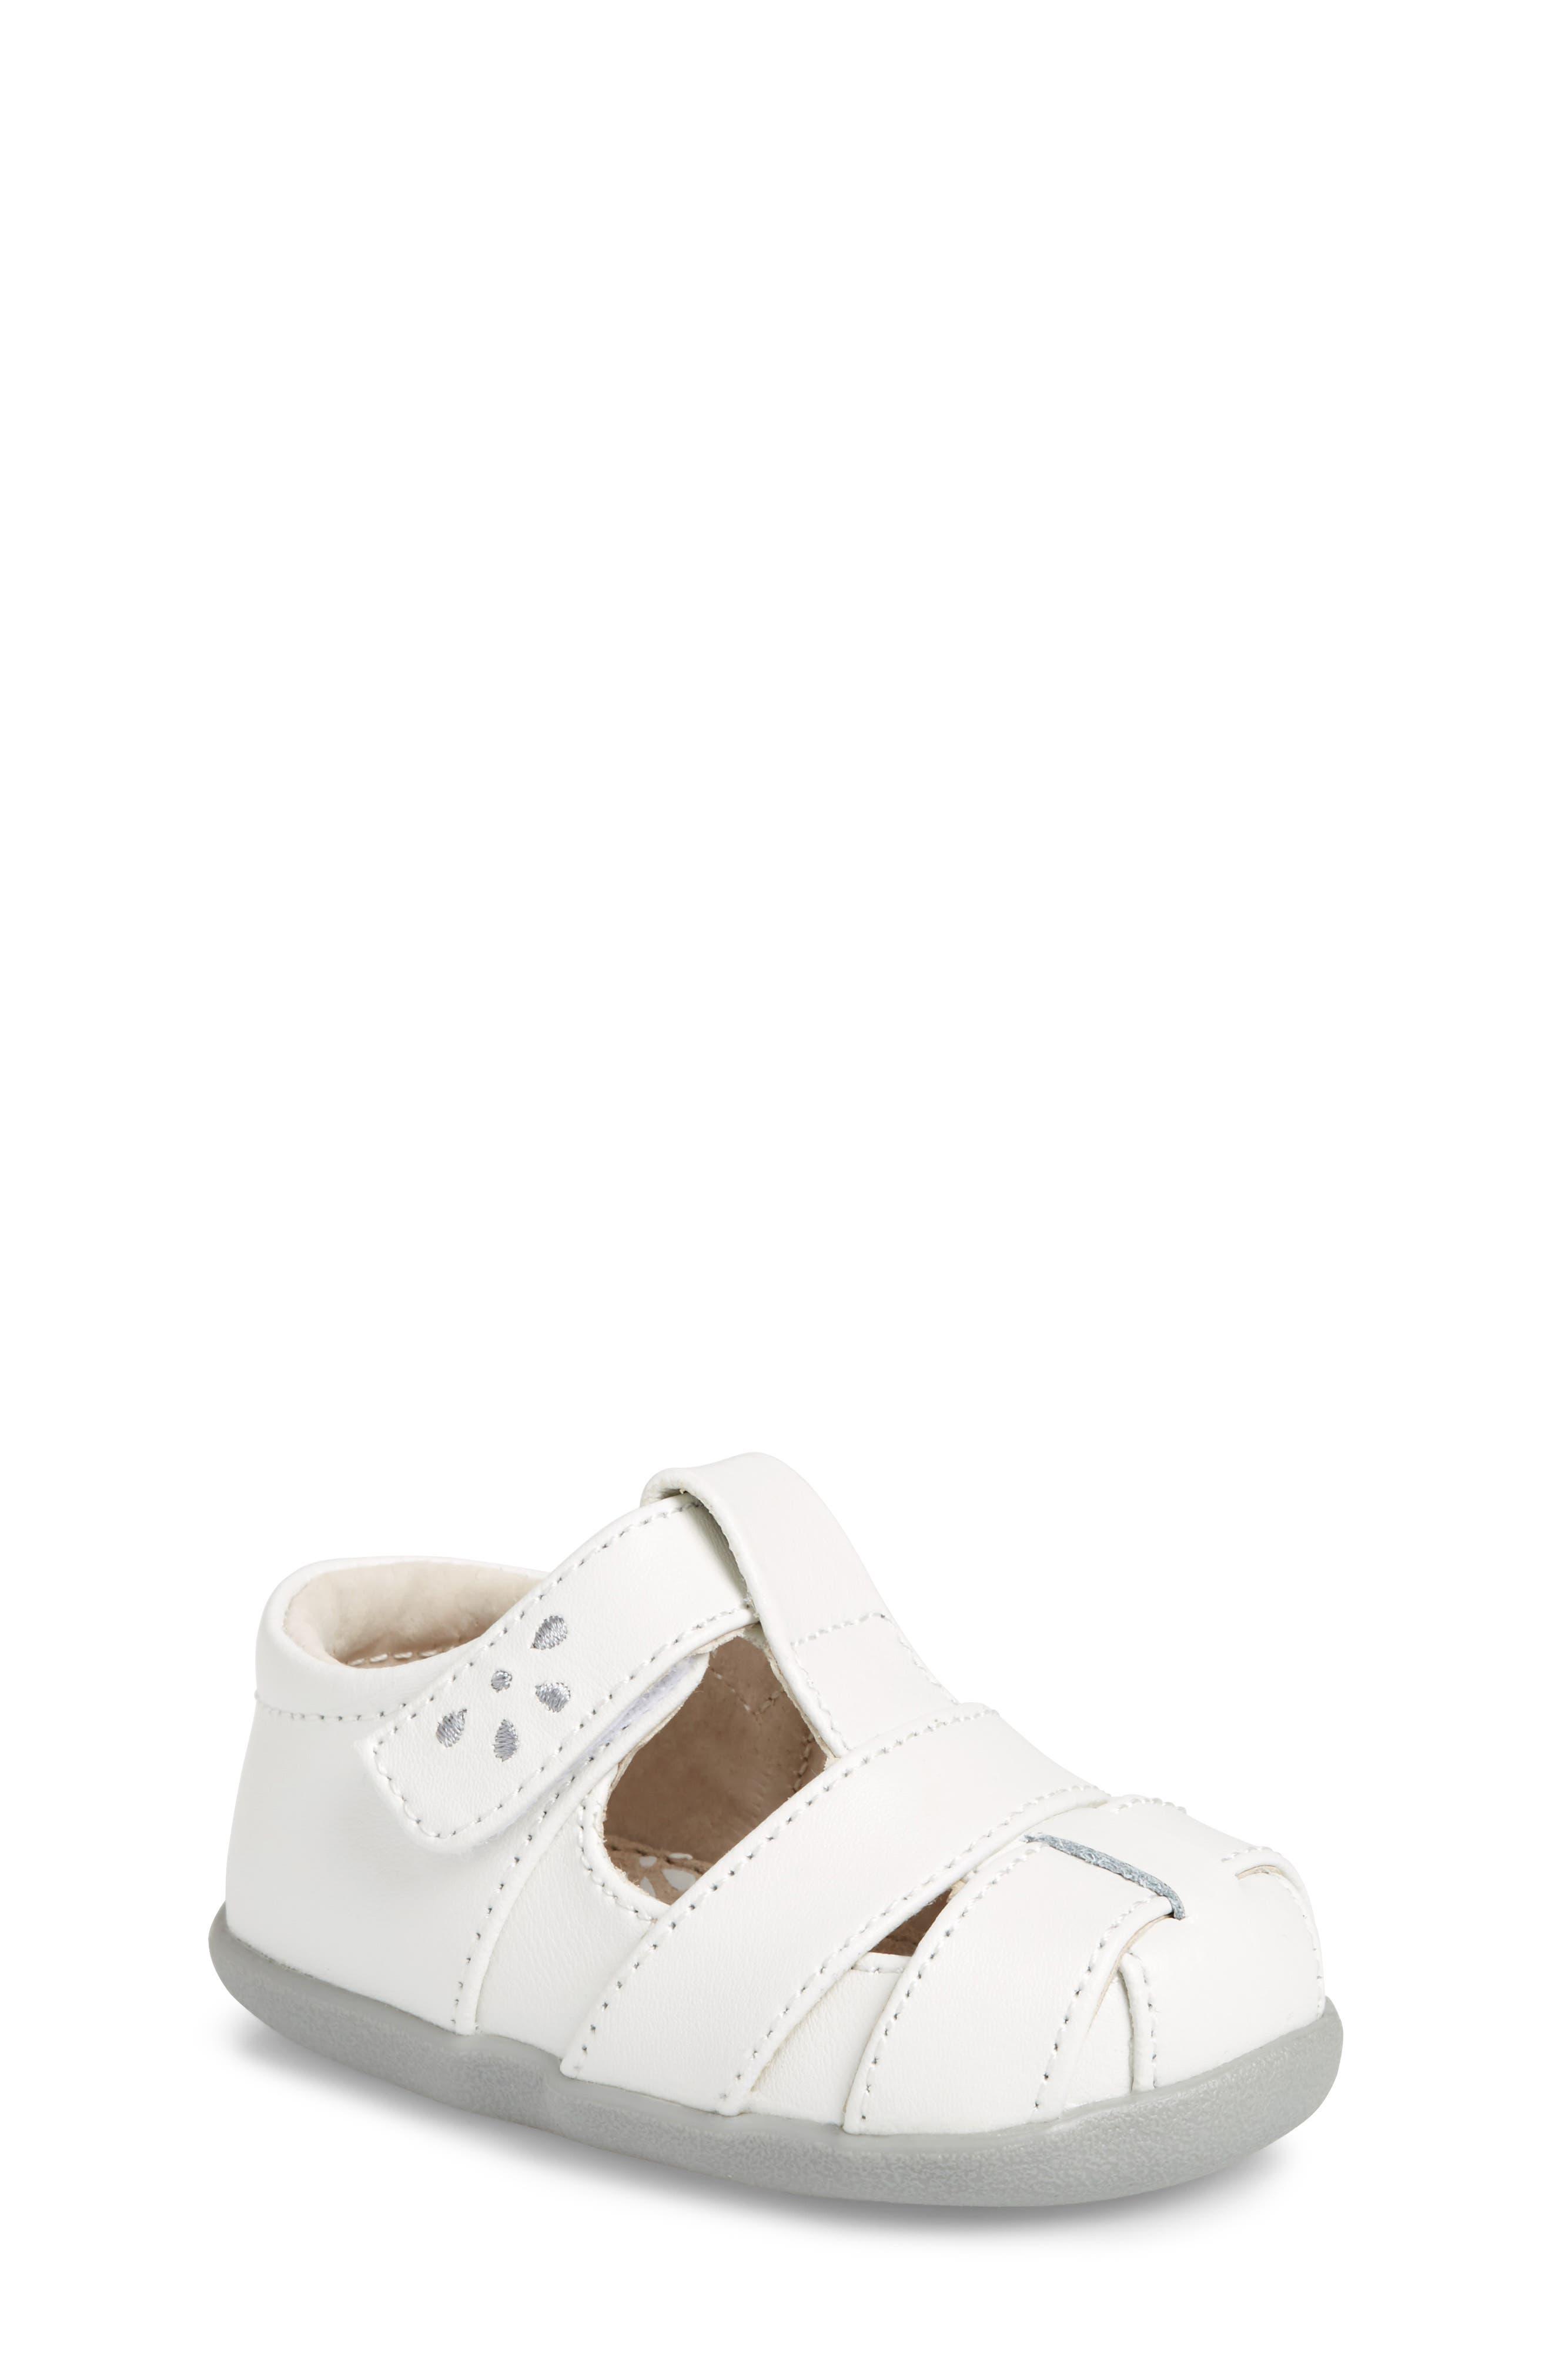 SEE KAI RUN Brook III Sandal, Main, color, WHITE